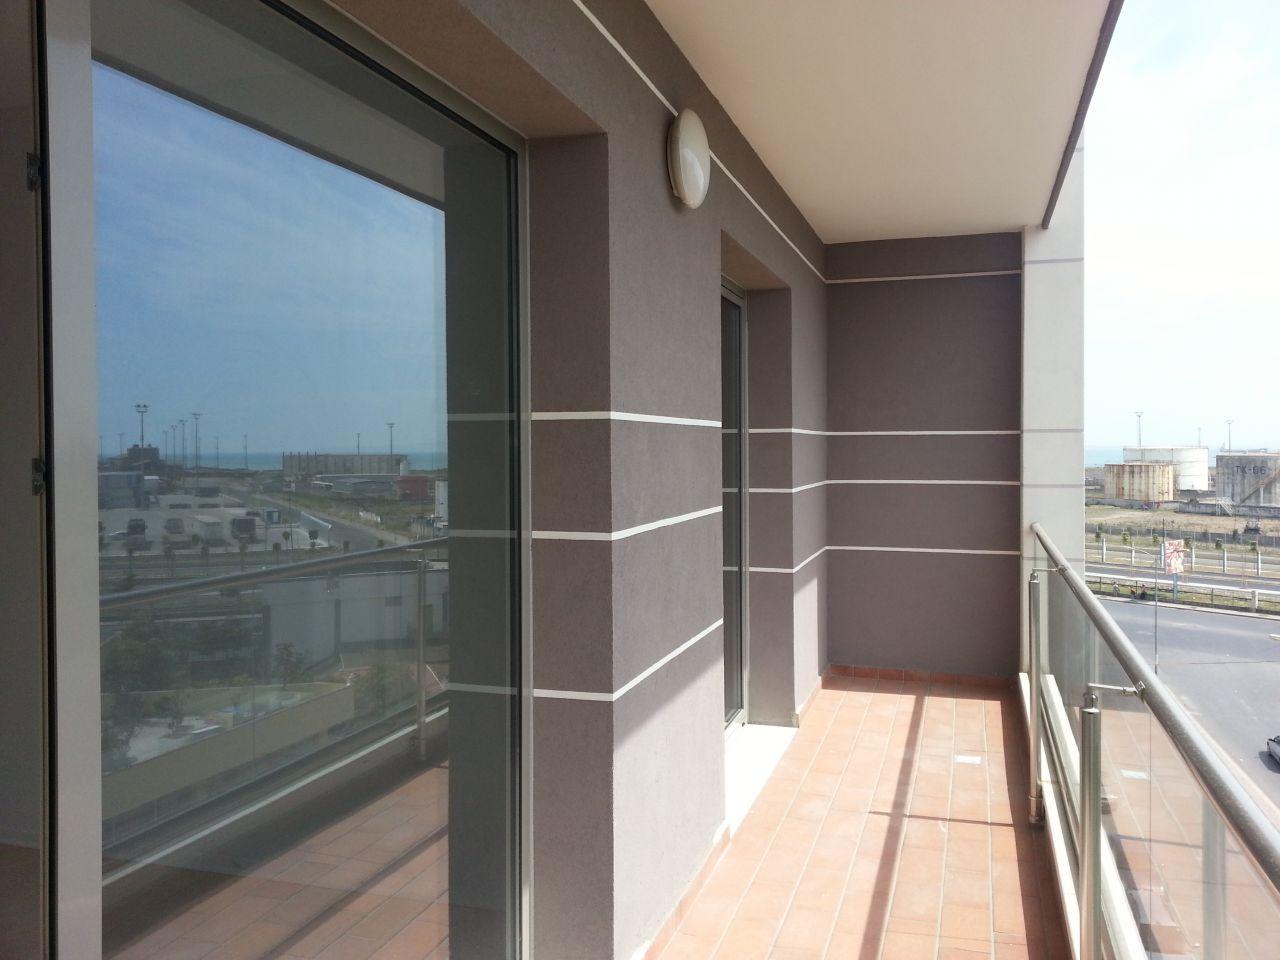 Real Estate in Albania. Durres